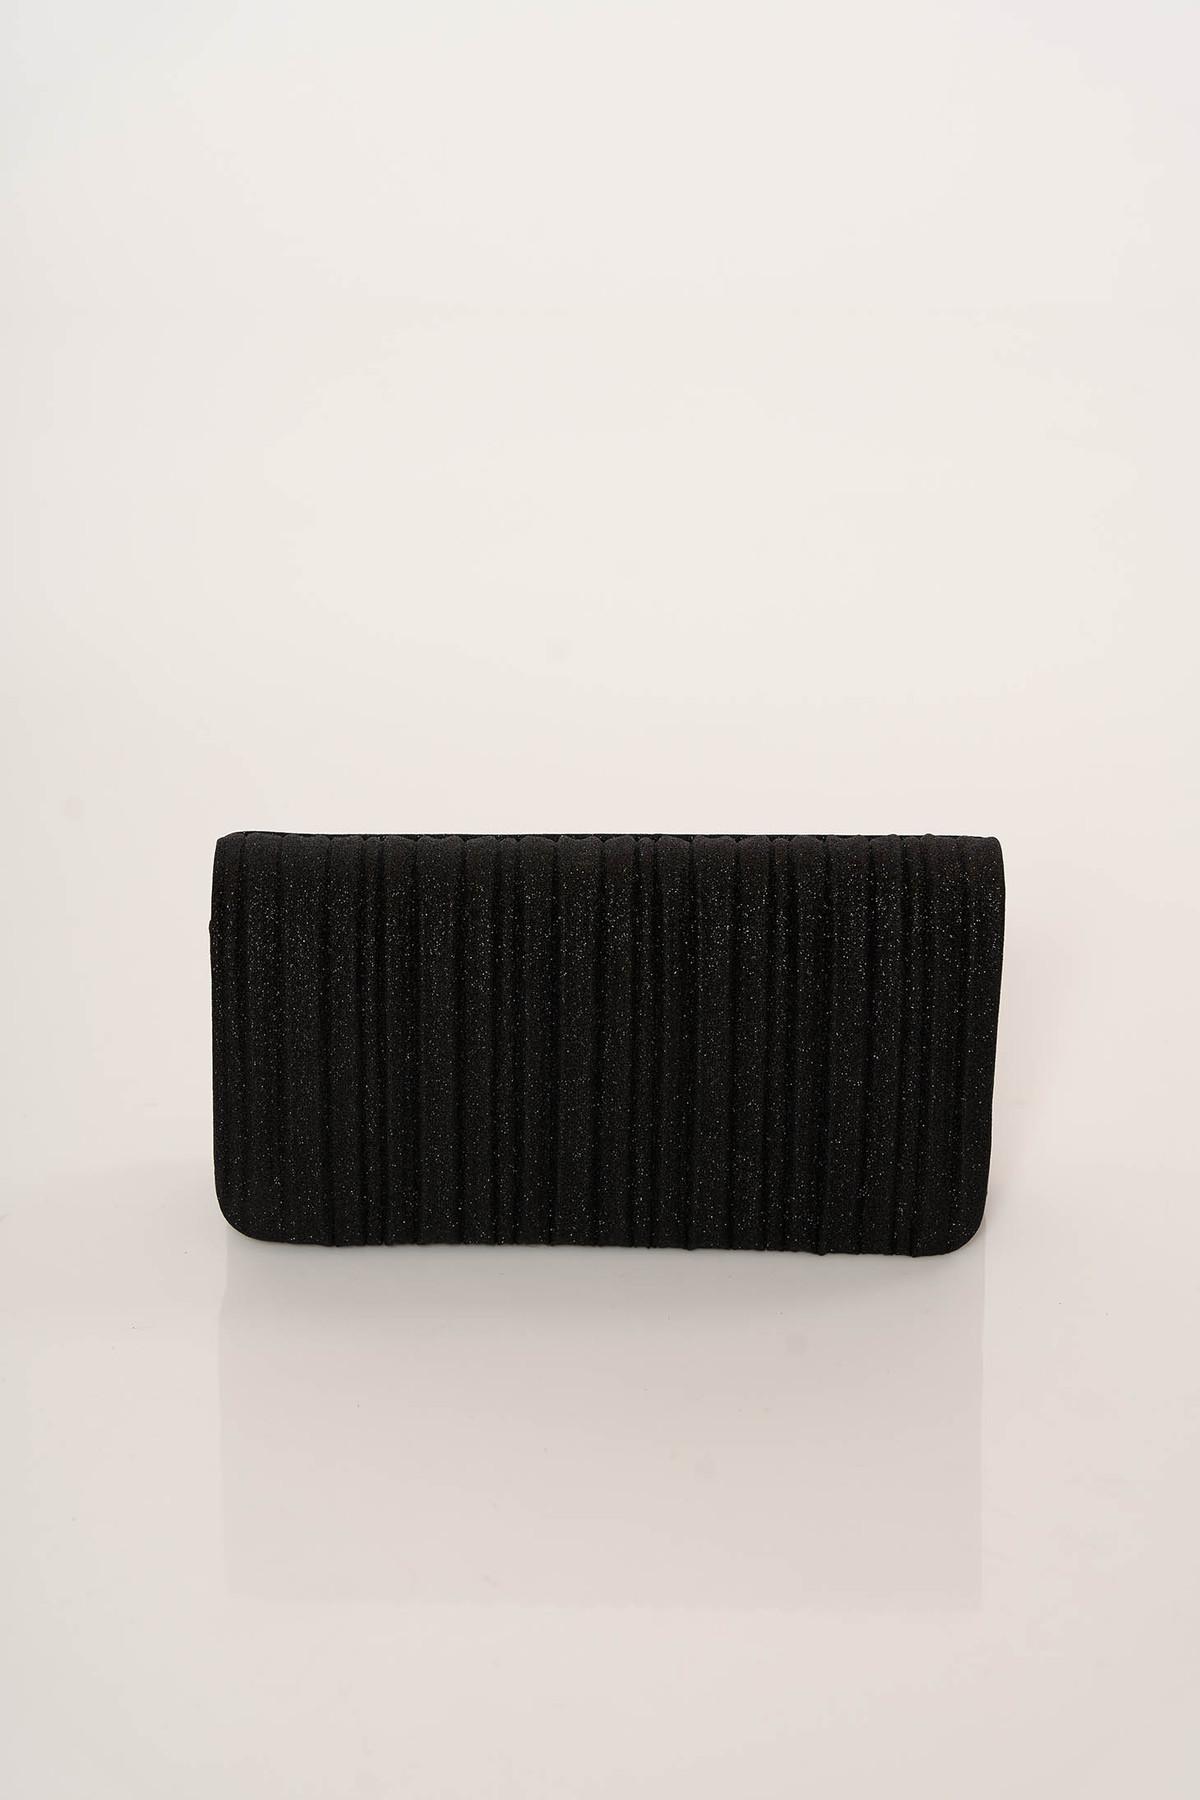 Geanta dama neagra plic eleganta accesorizata cu lant metalic cu un compartiment cu buzunar interior